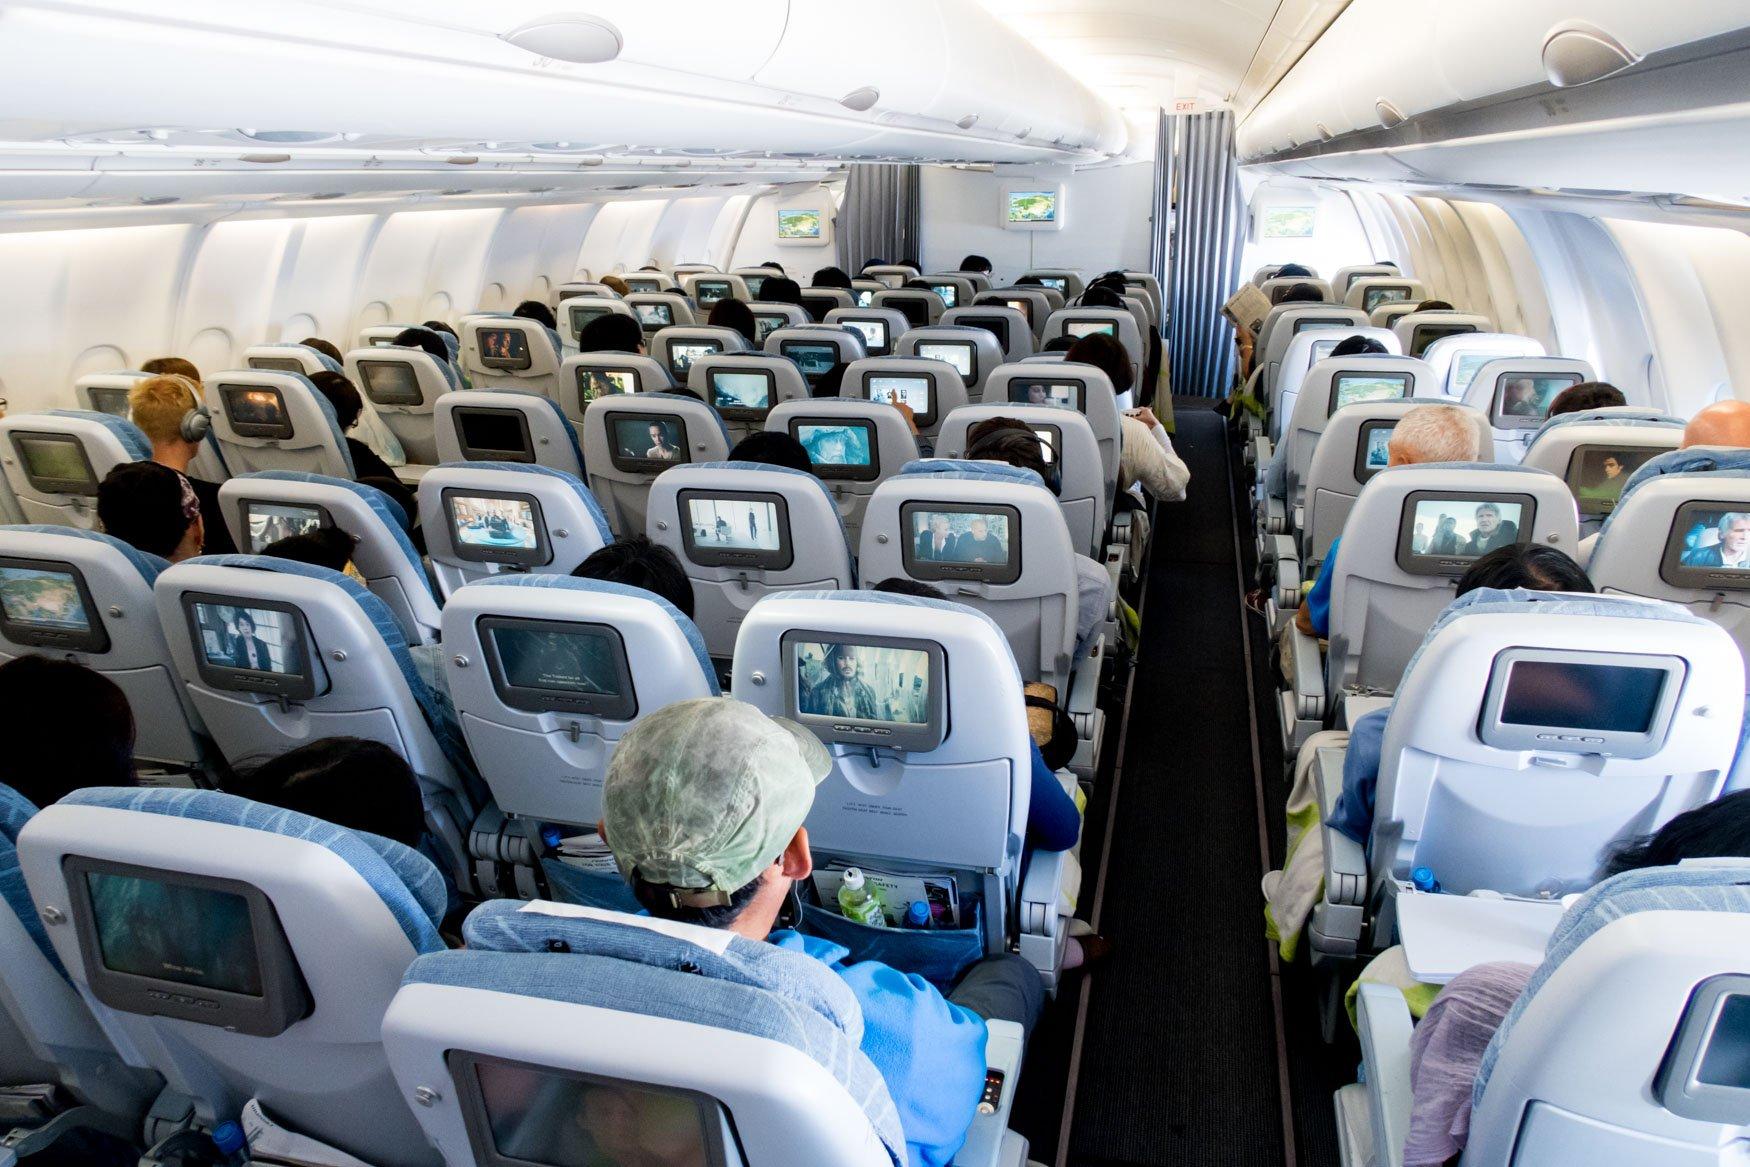 Finnair A330-300 Economy Class Cabin